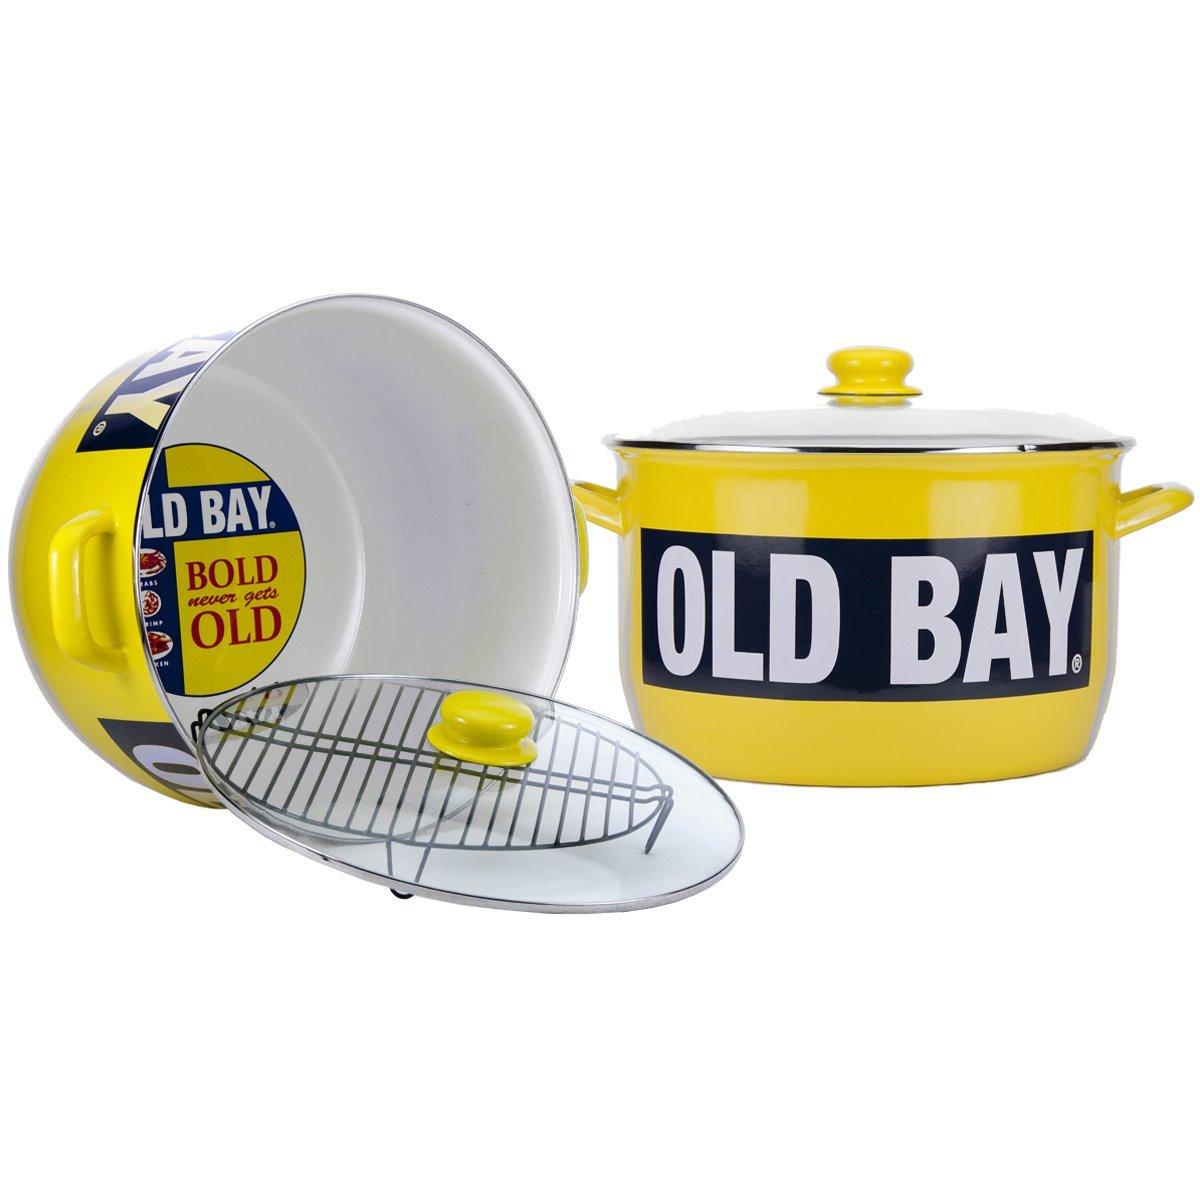 Enamelware - Old Bay Pattern - 18 quart Stock Pot with Rack